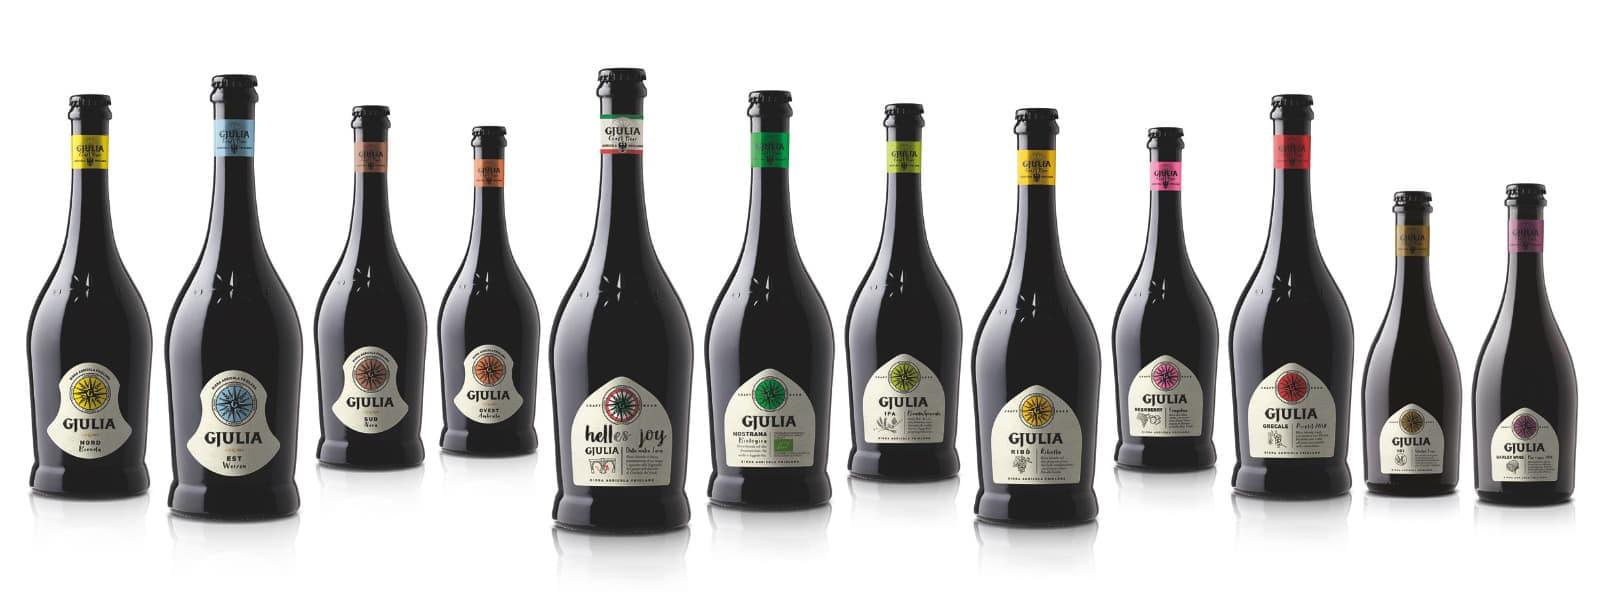 Birra Gjulia Full Family 1600x600 1